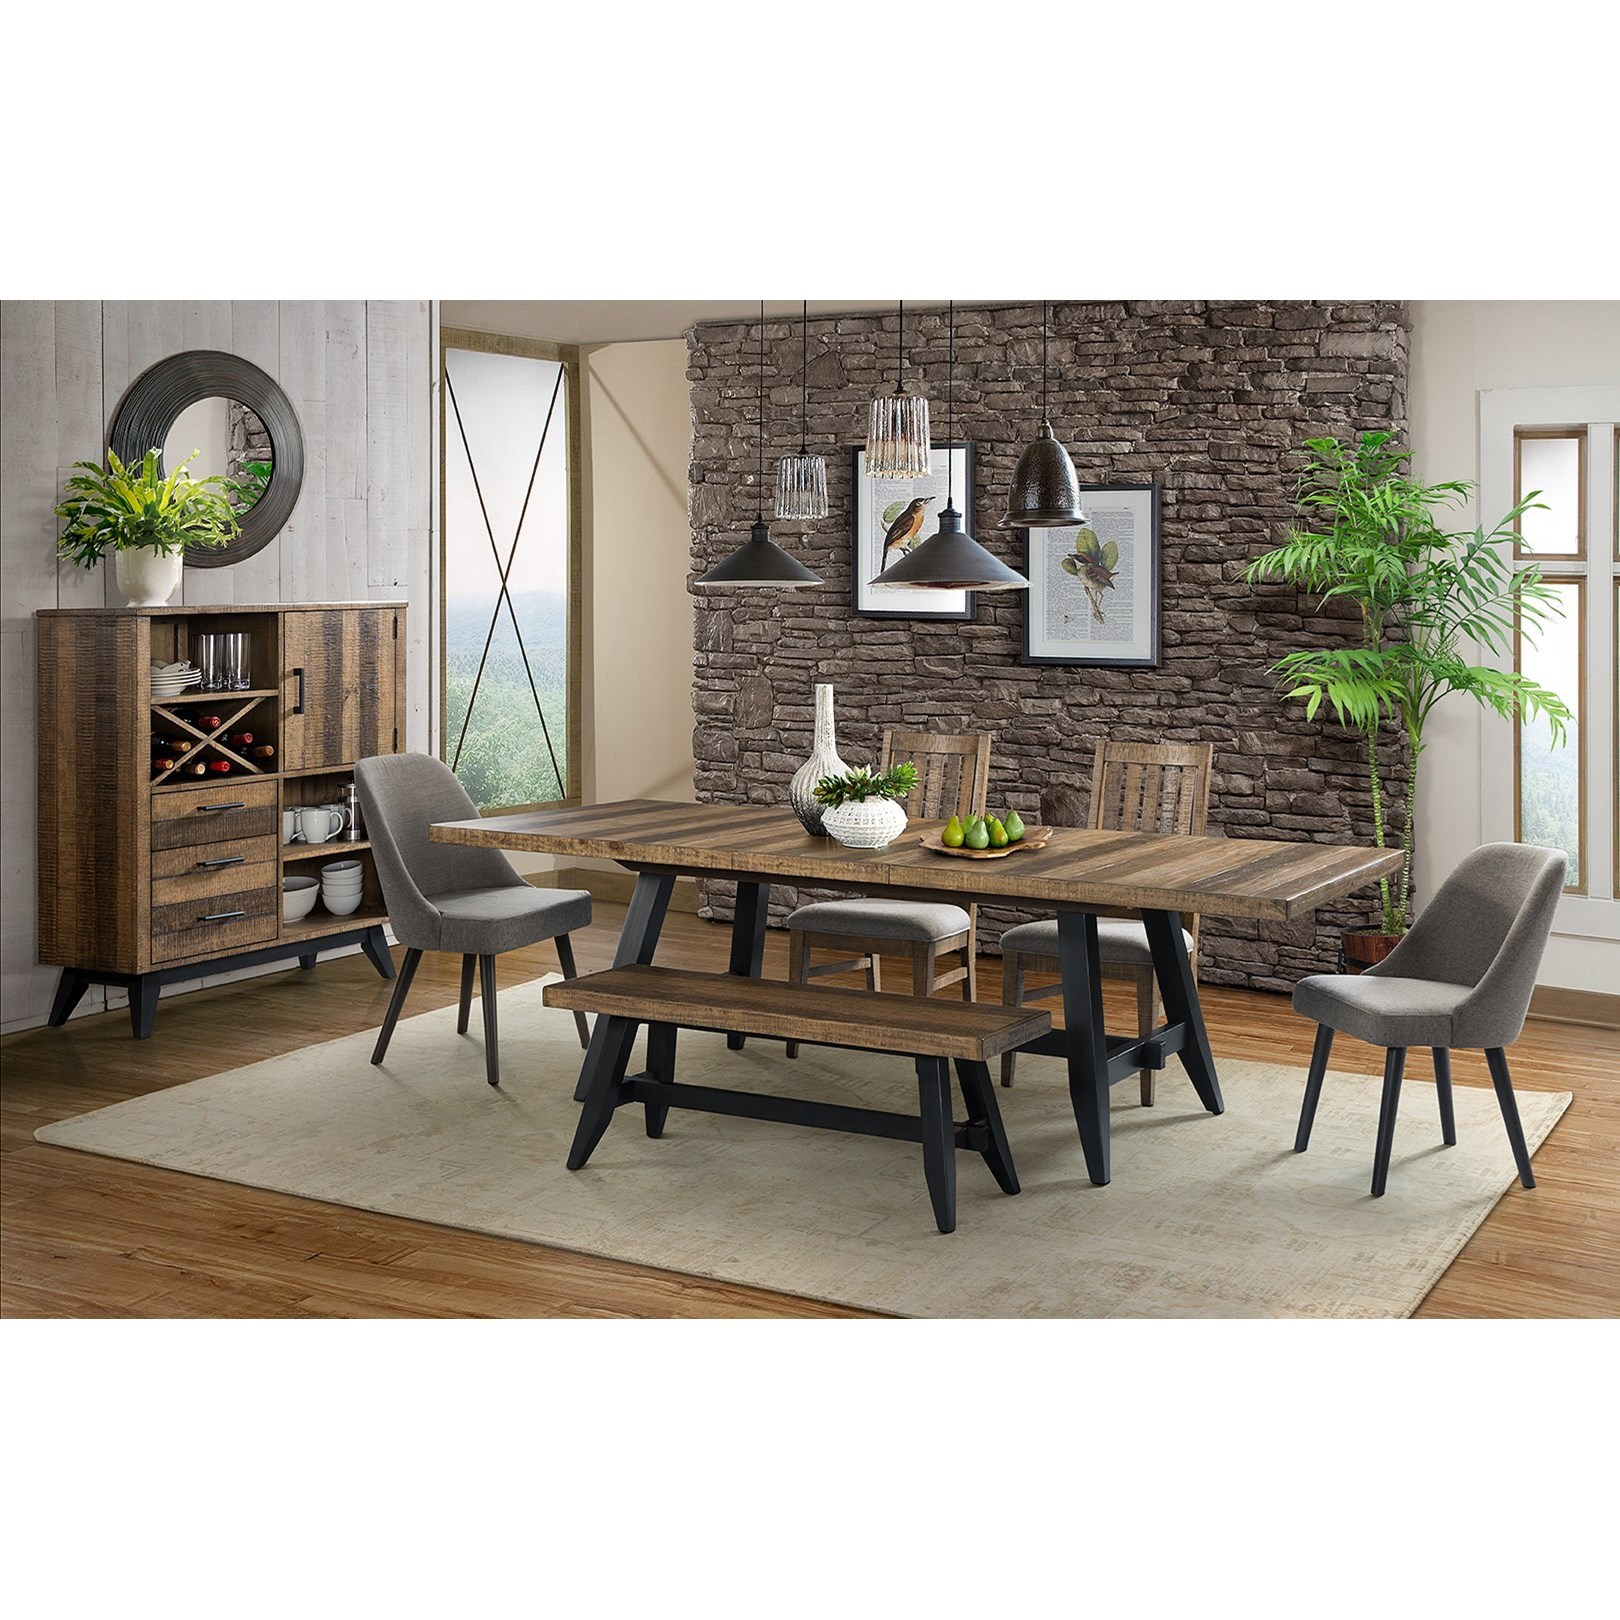 vfm signature urban rustic casual dining room group. Black Bedroom Furniture Sets. Home Design Ideas